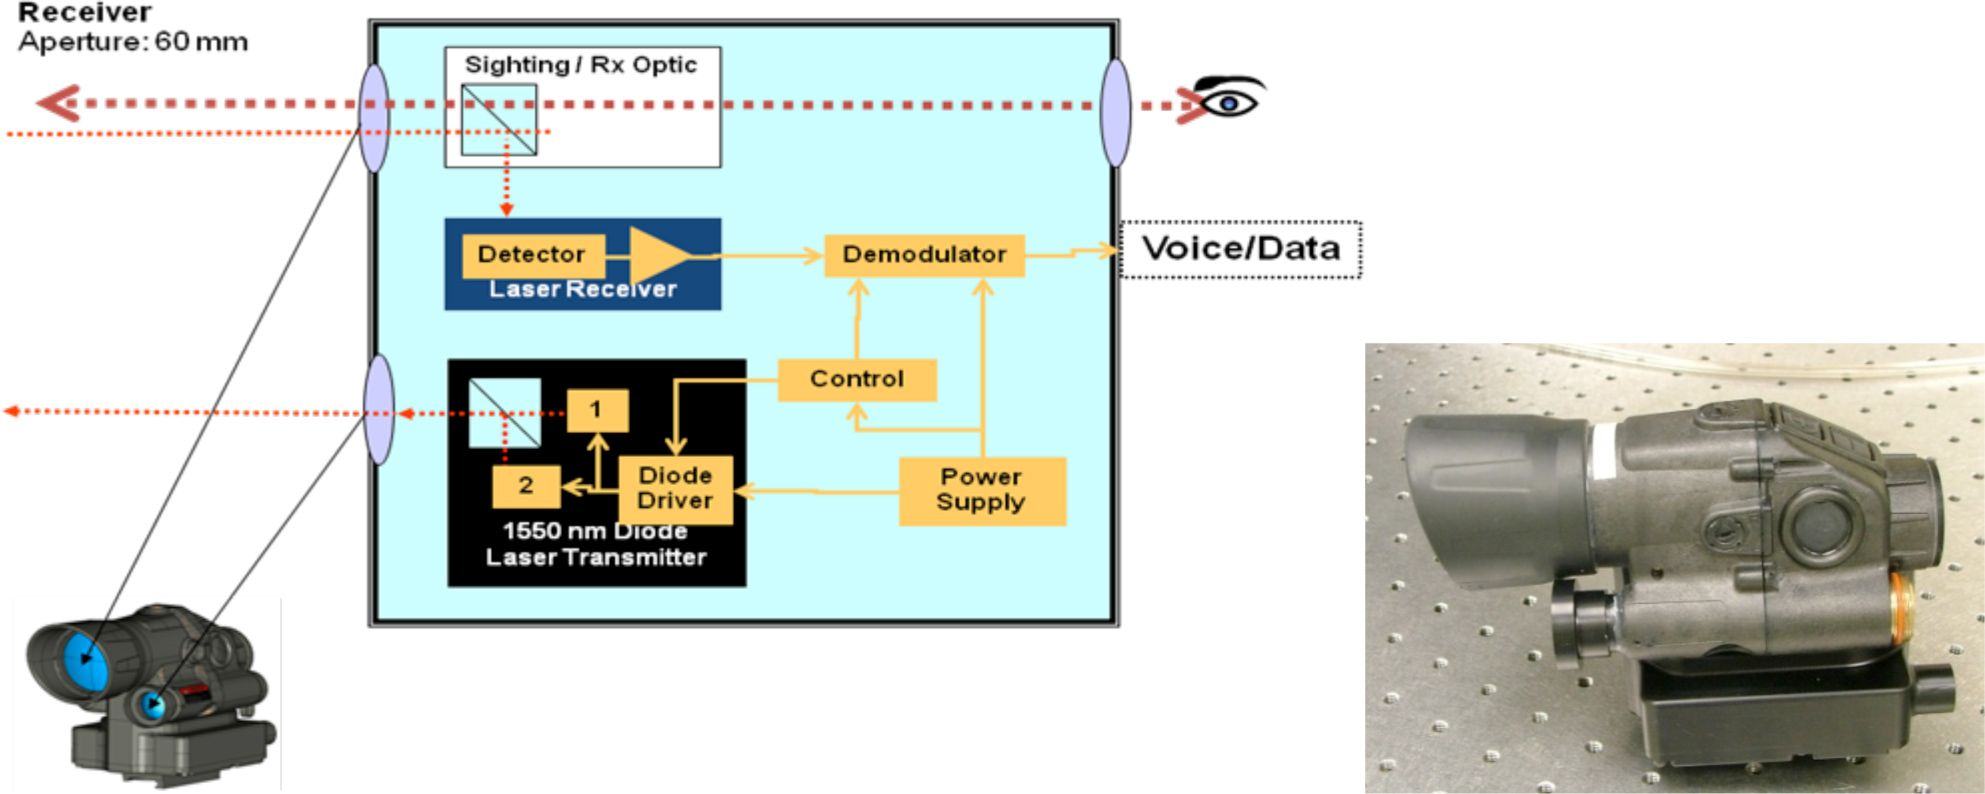 Secure Optical Communication System Utilizing Deformable Mems Laser Receiver Circuit Schematic Design Fig3 Transceiver And Block Diagram